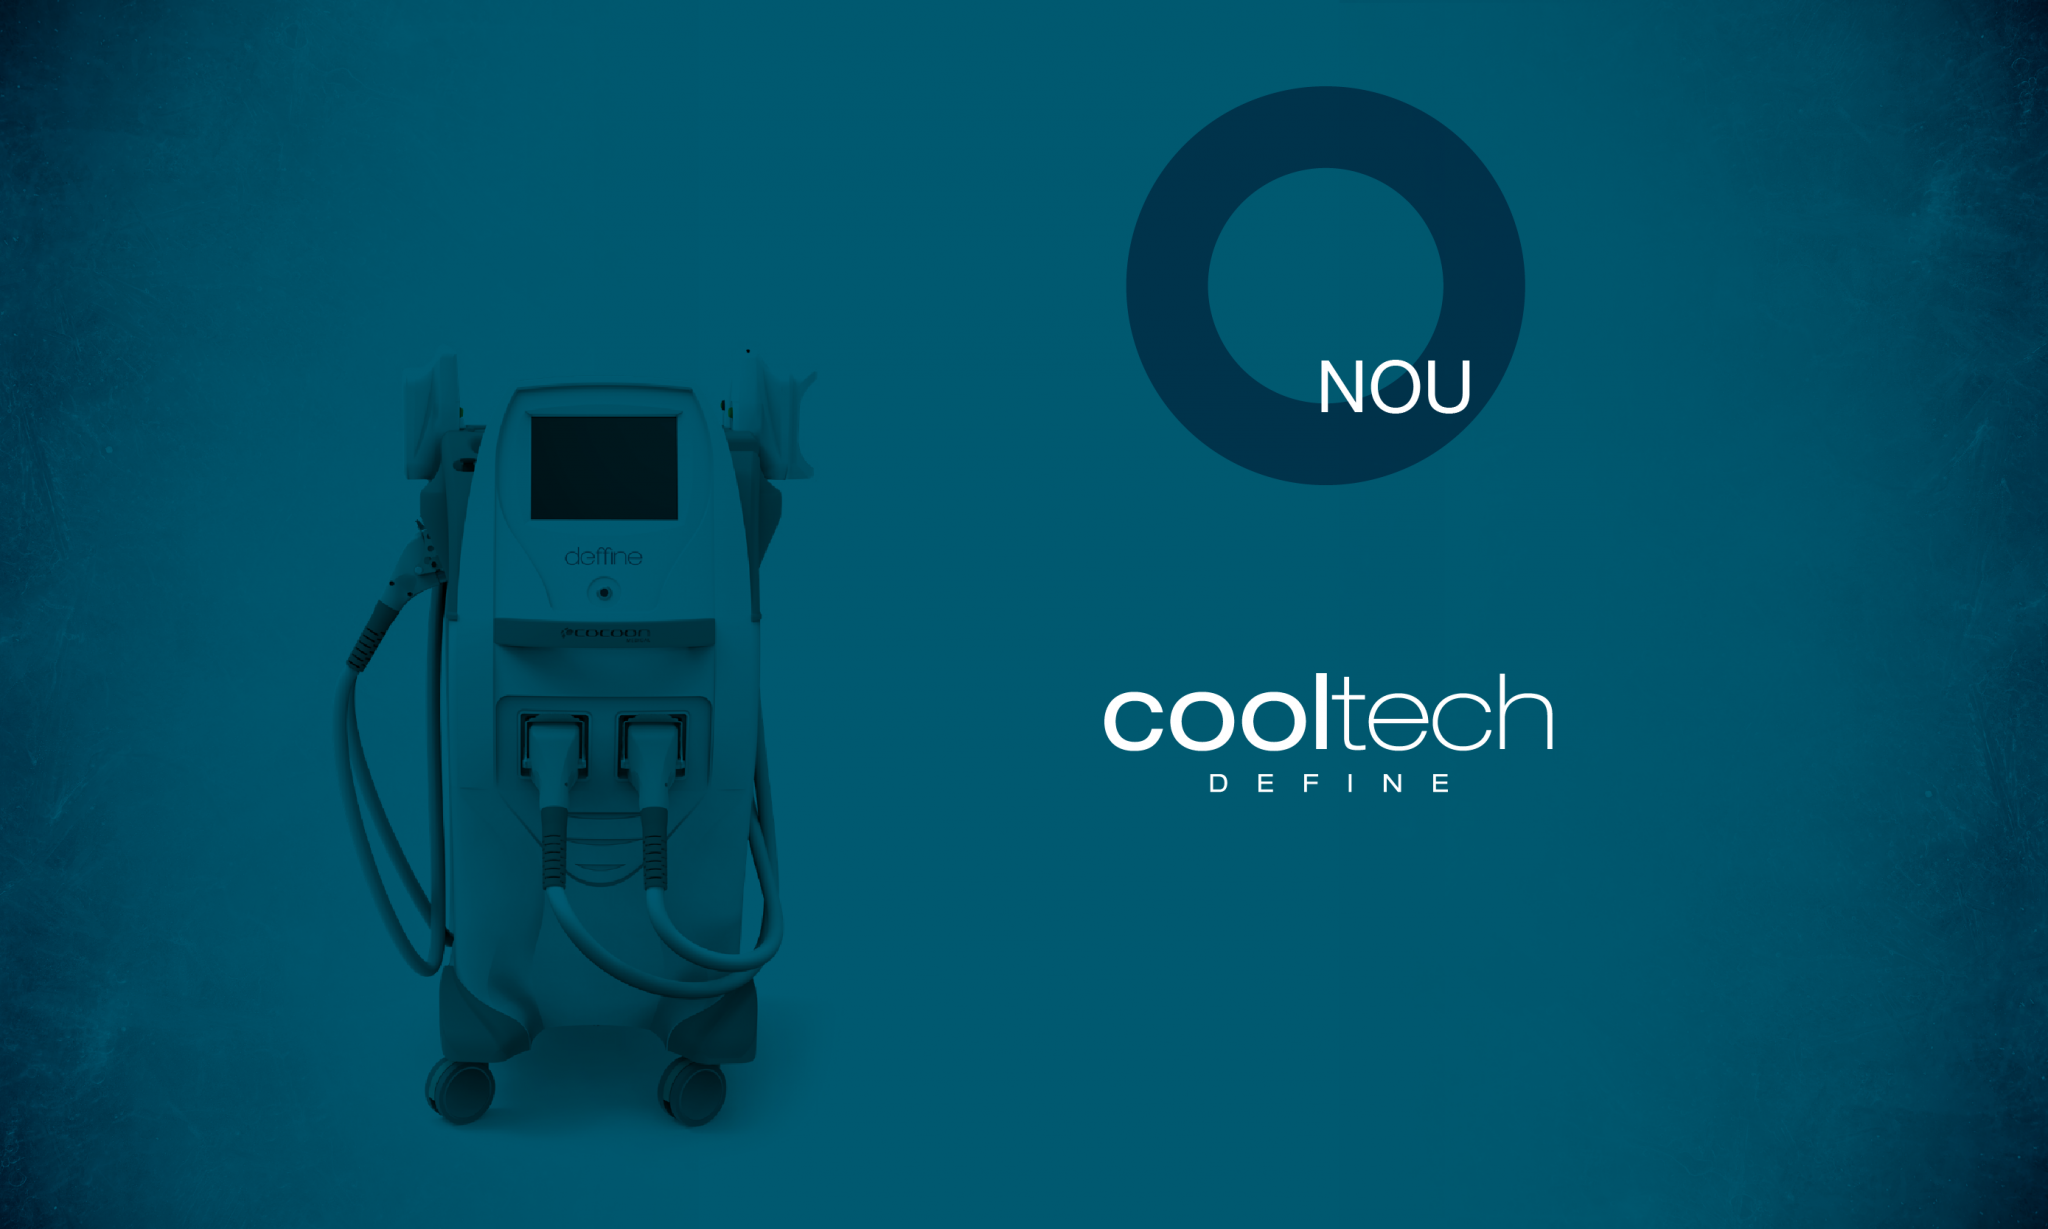 Cooltech Define Crio-Sculptare